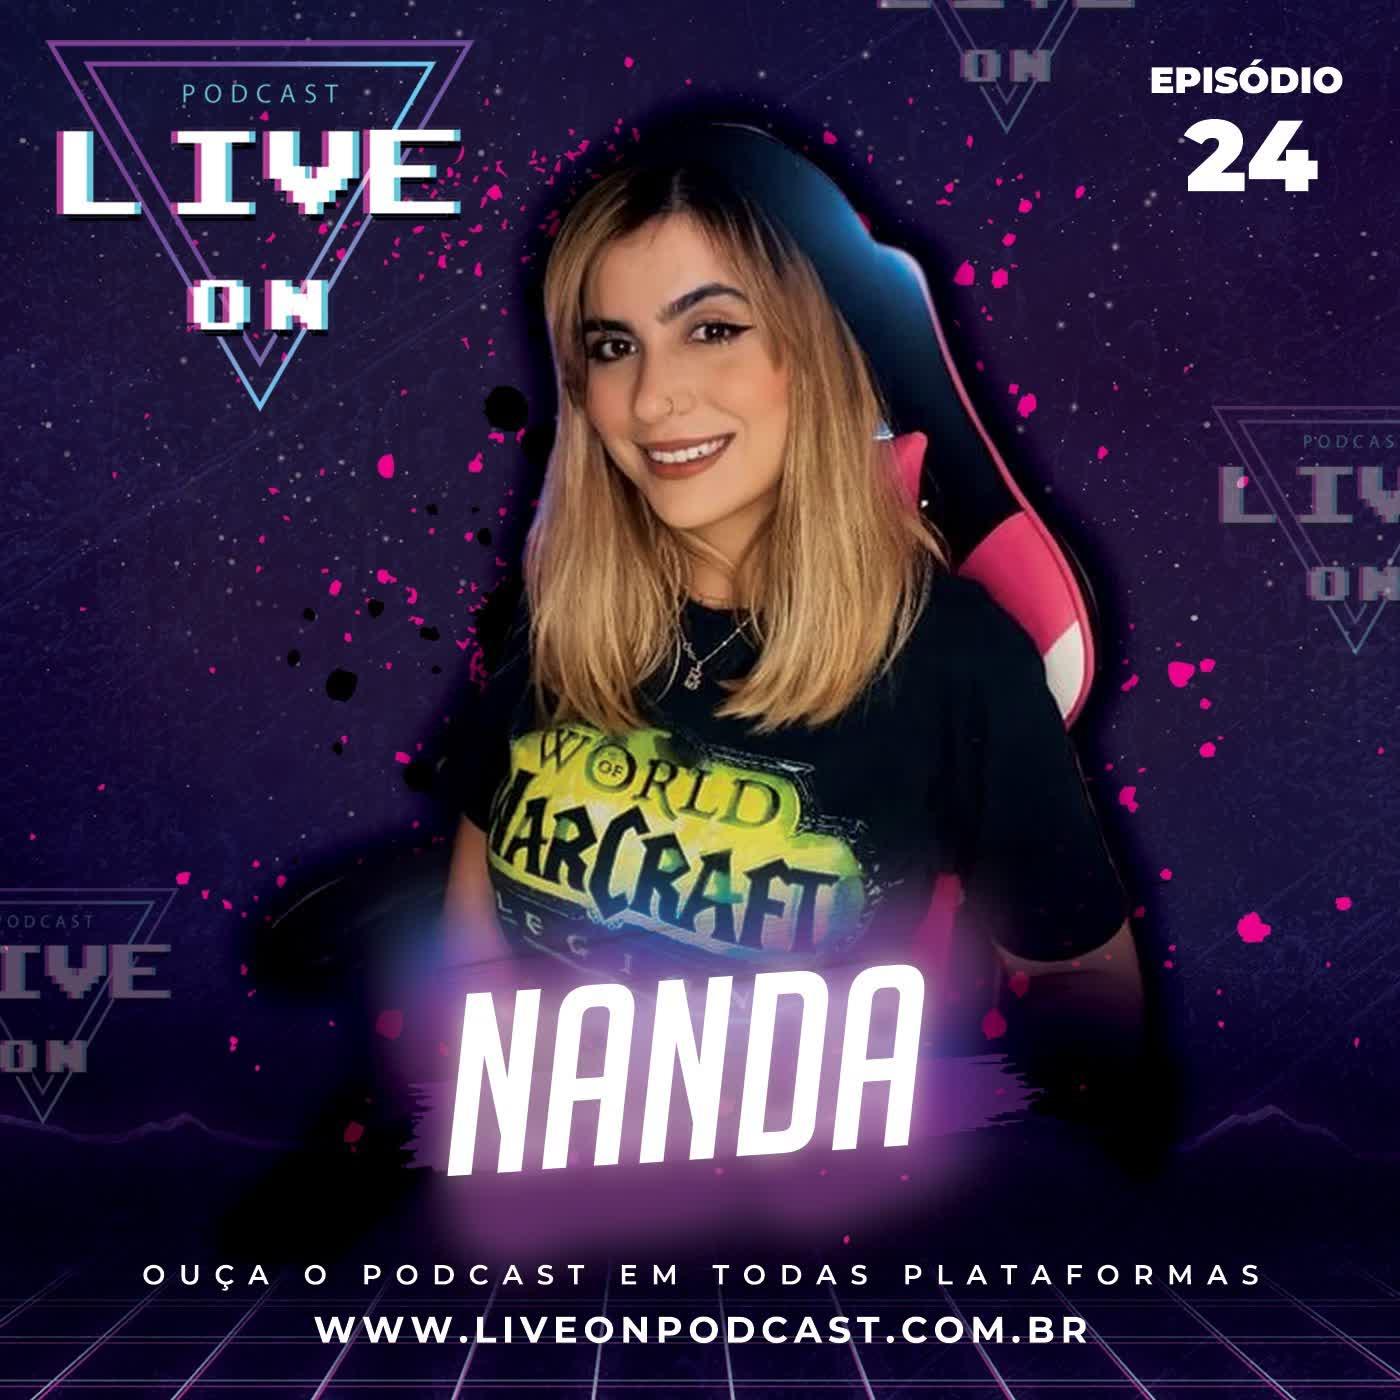 Live On Podcast - Convidada: Nanda - Episódio 24